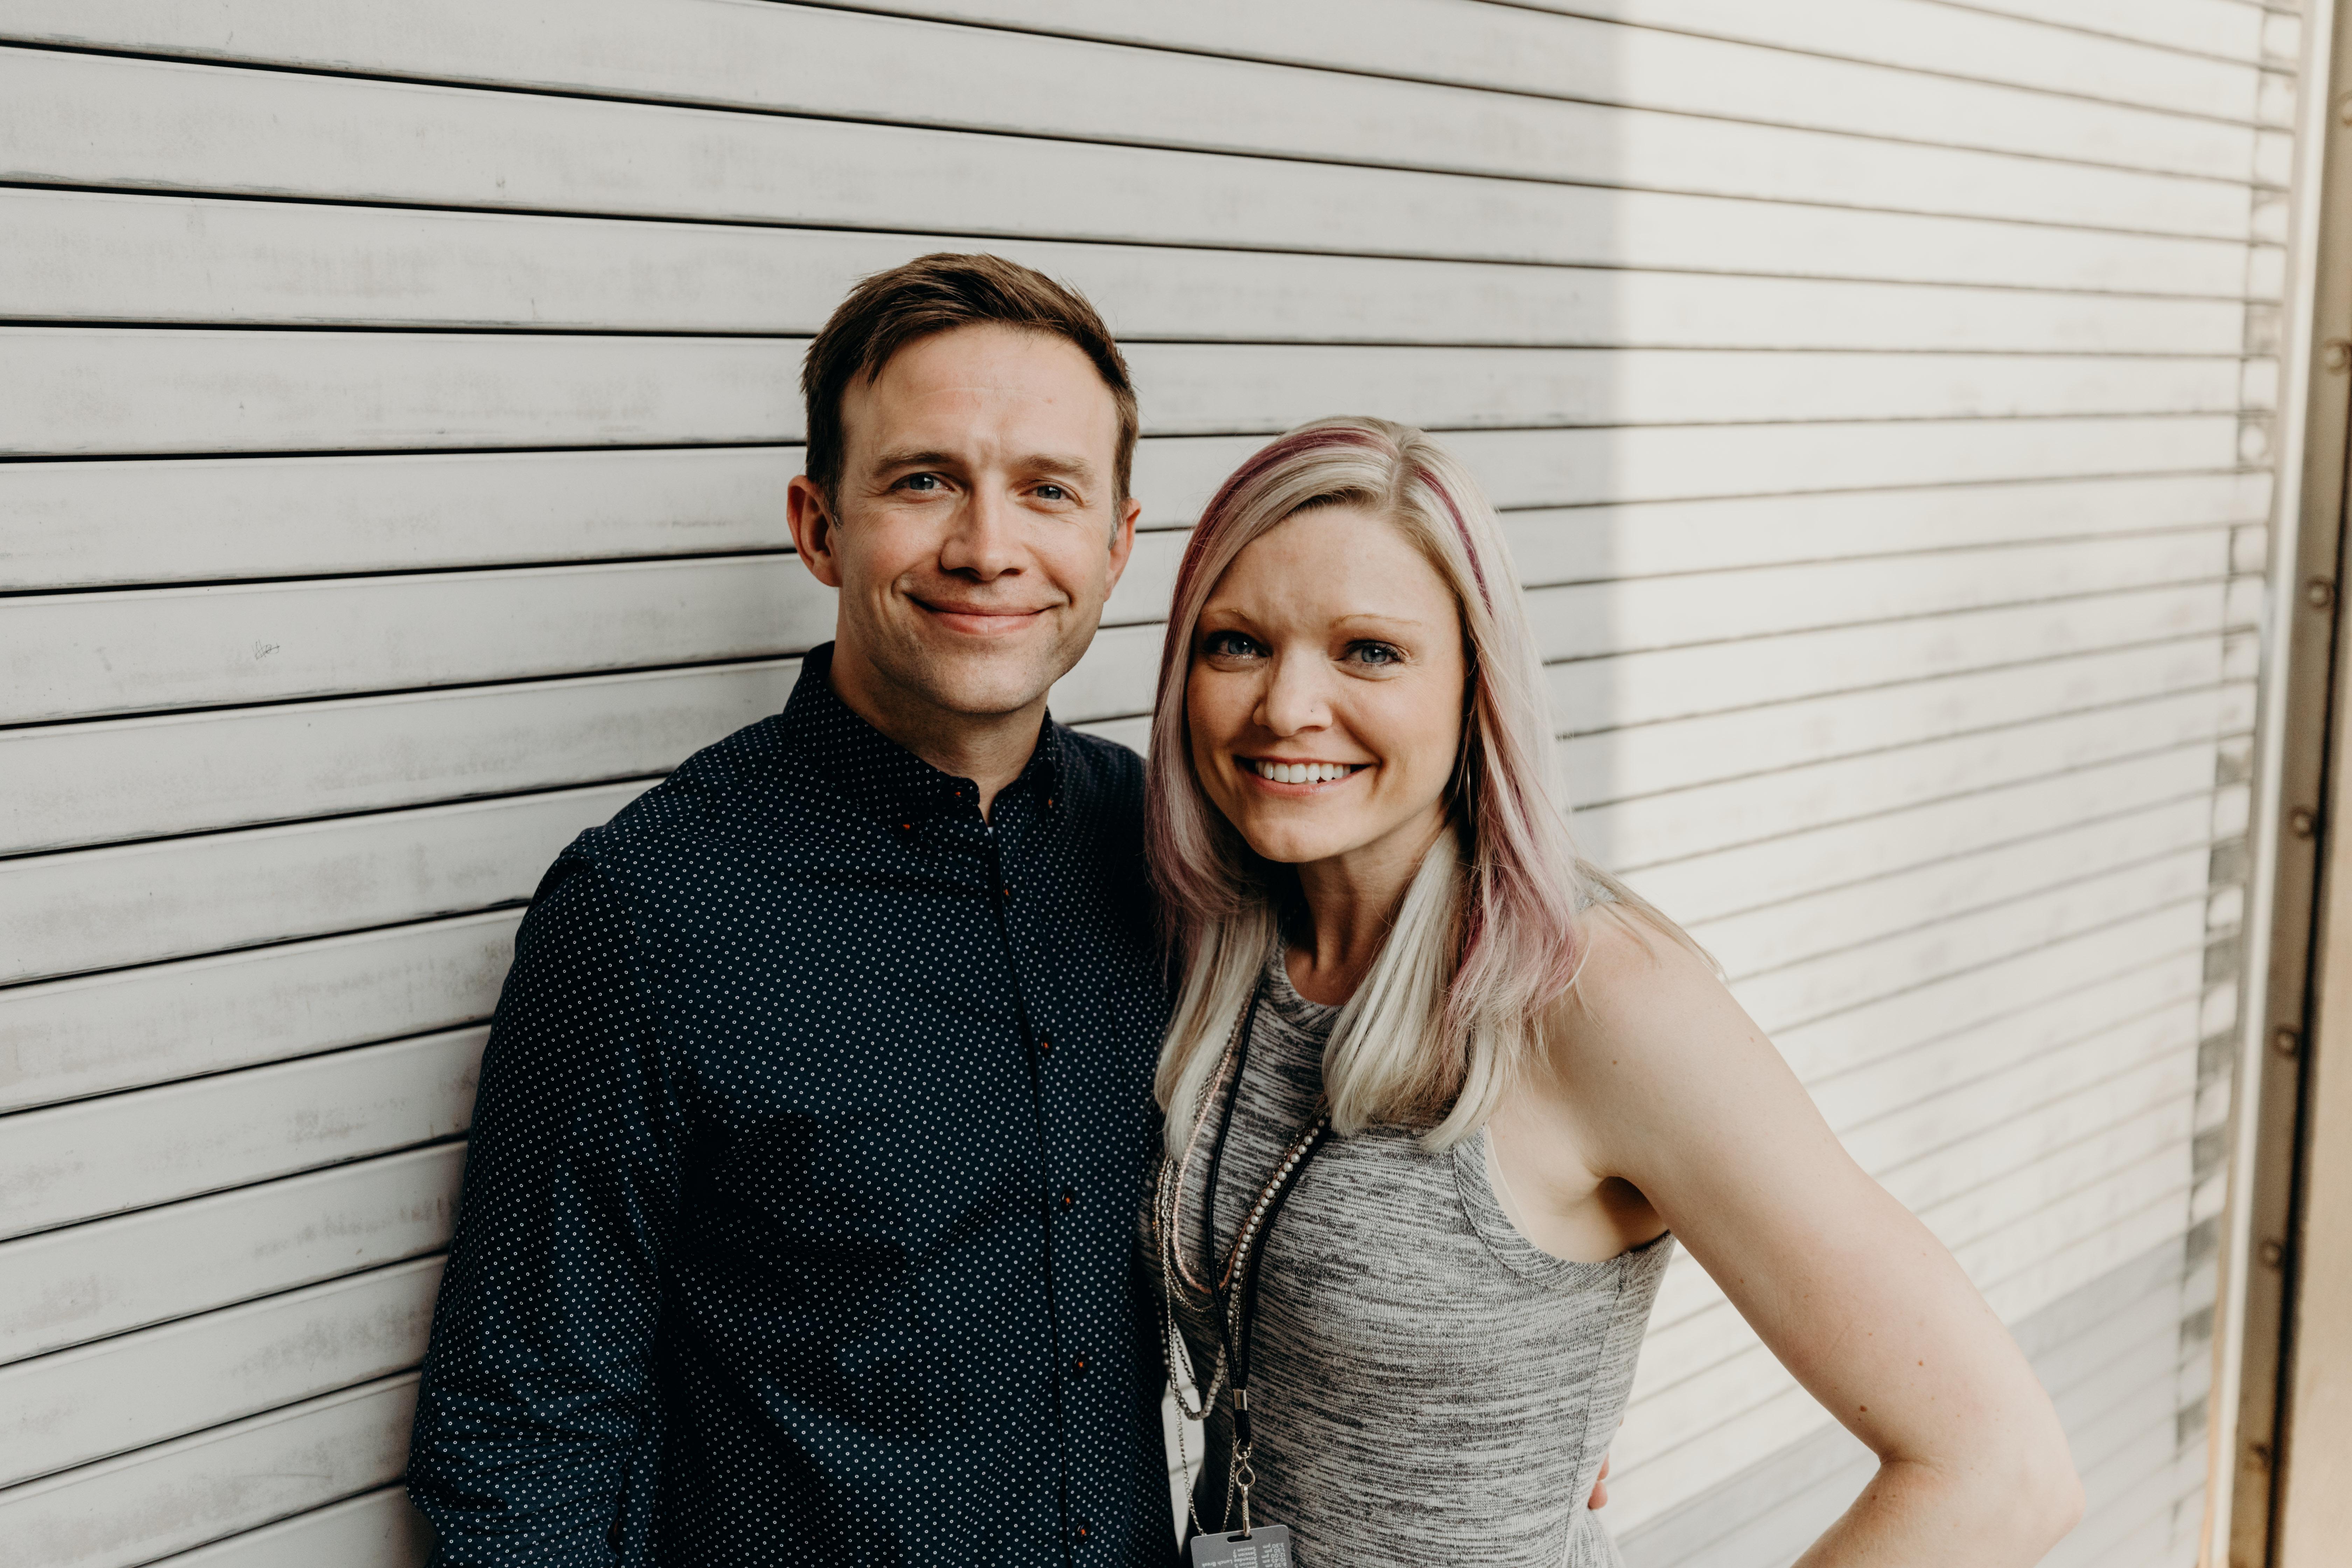 Frank and Jessica Bealer